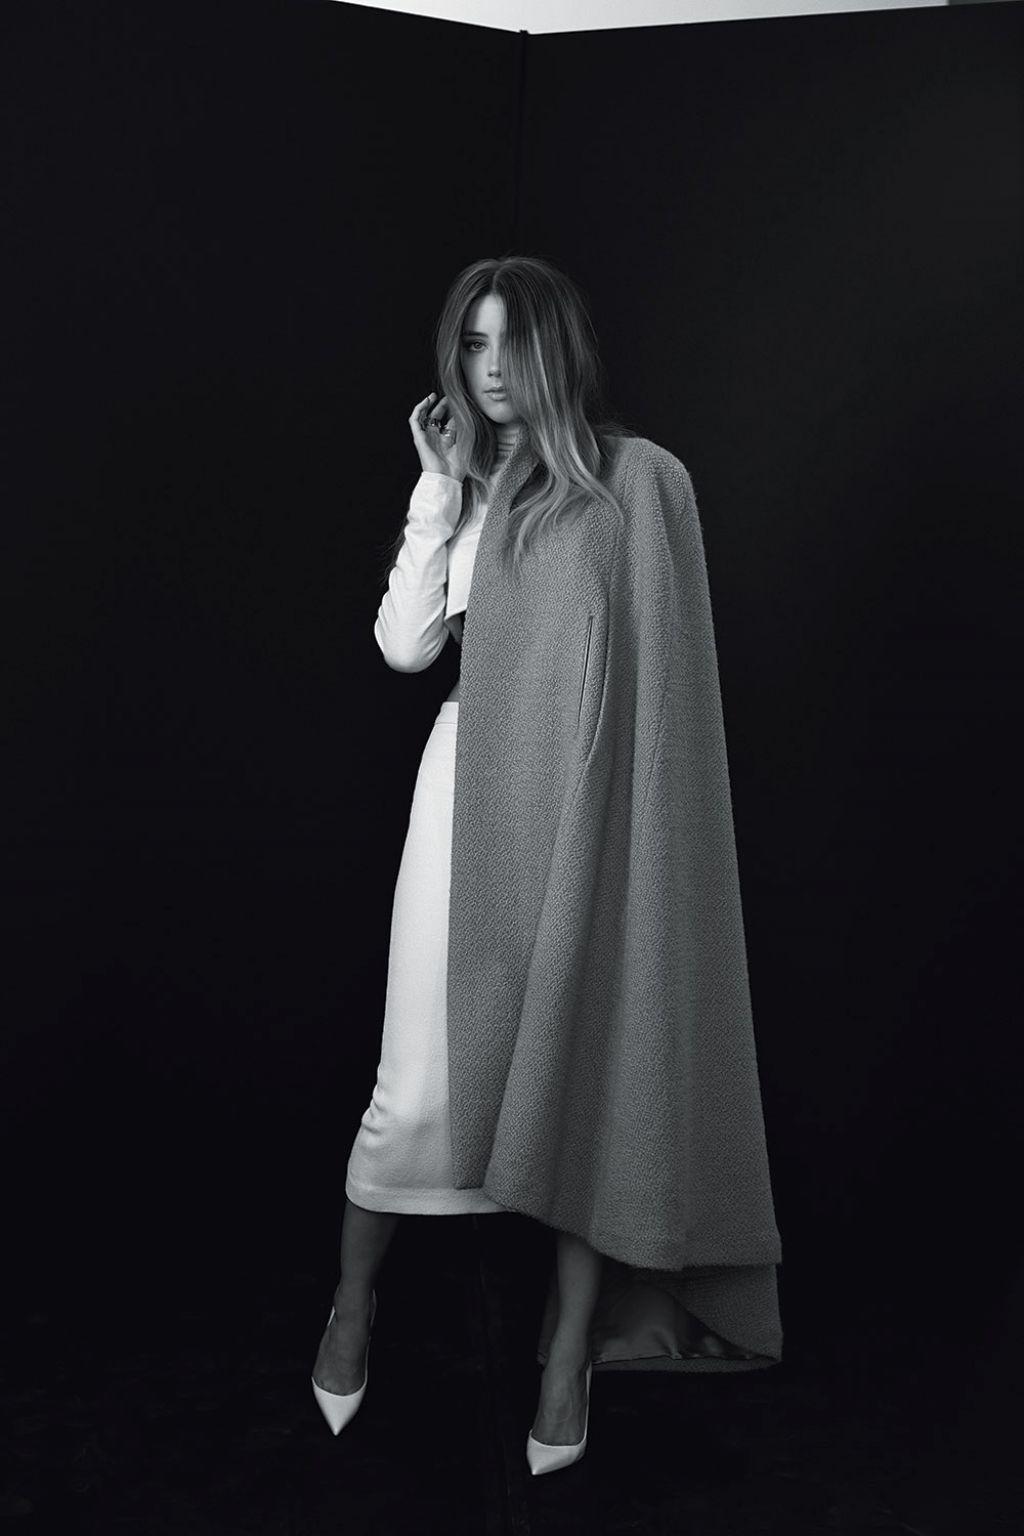 Photoshoot For Vogue Magazine November 2015